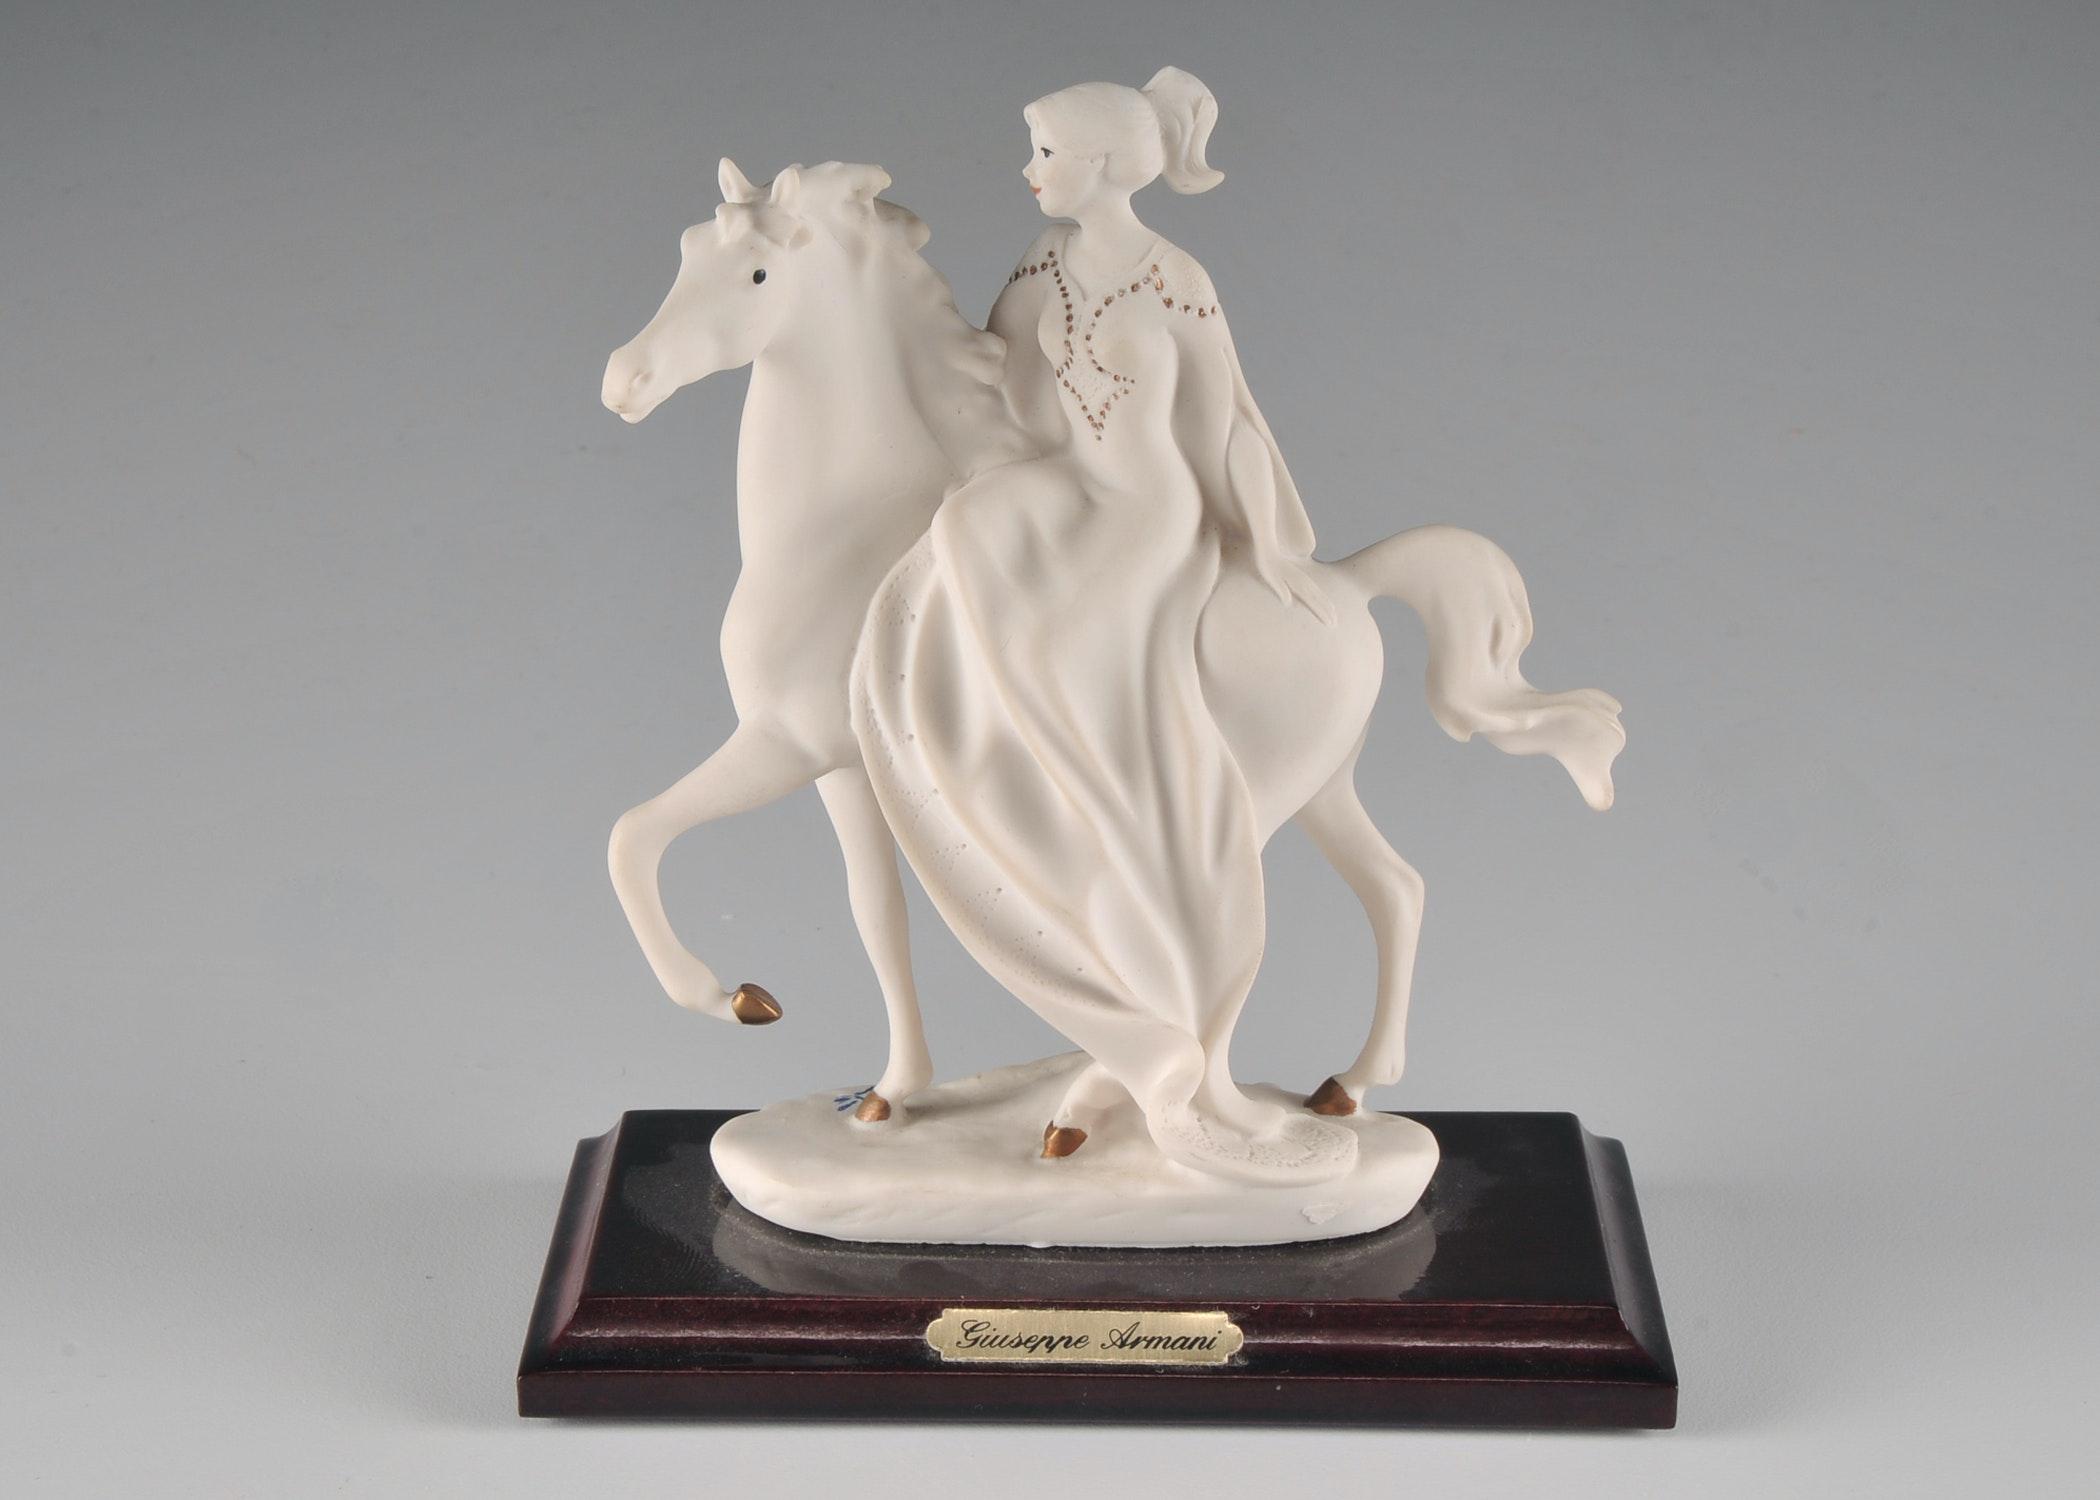 Signed Florence Giuseppe Armani Mounted Figurine of a Woman on Horseback